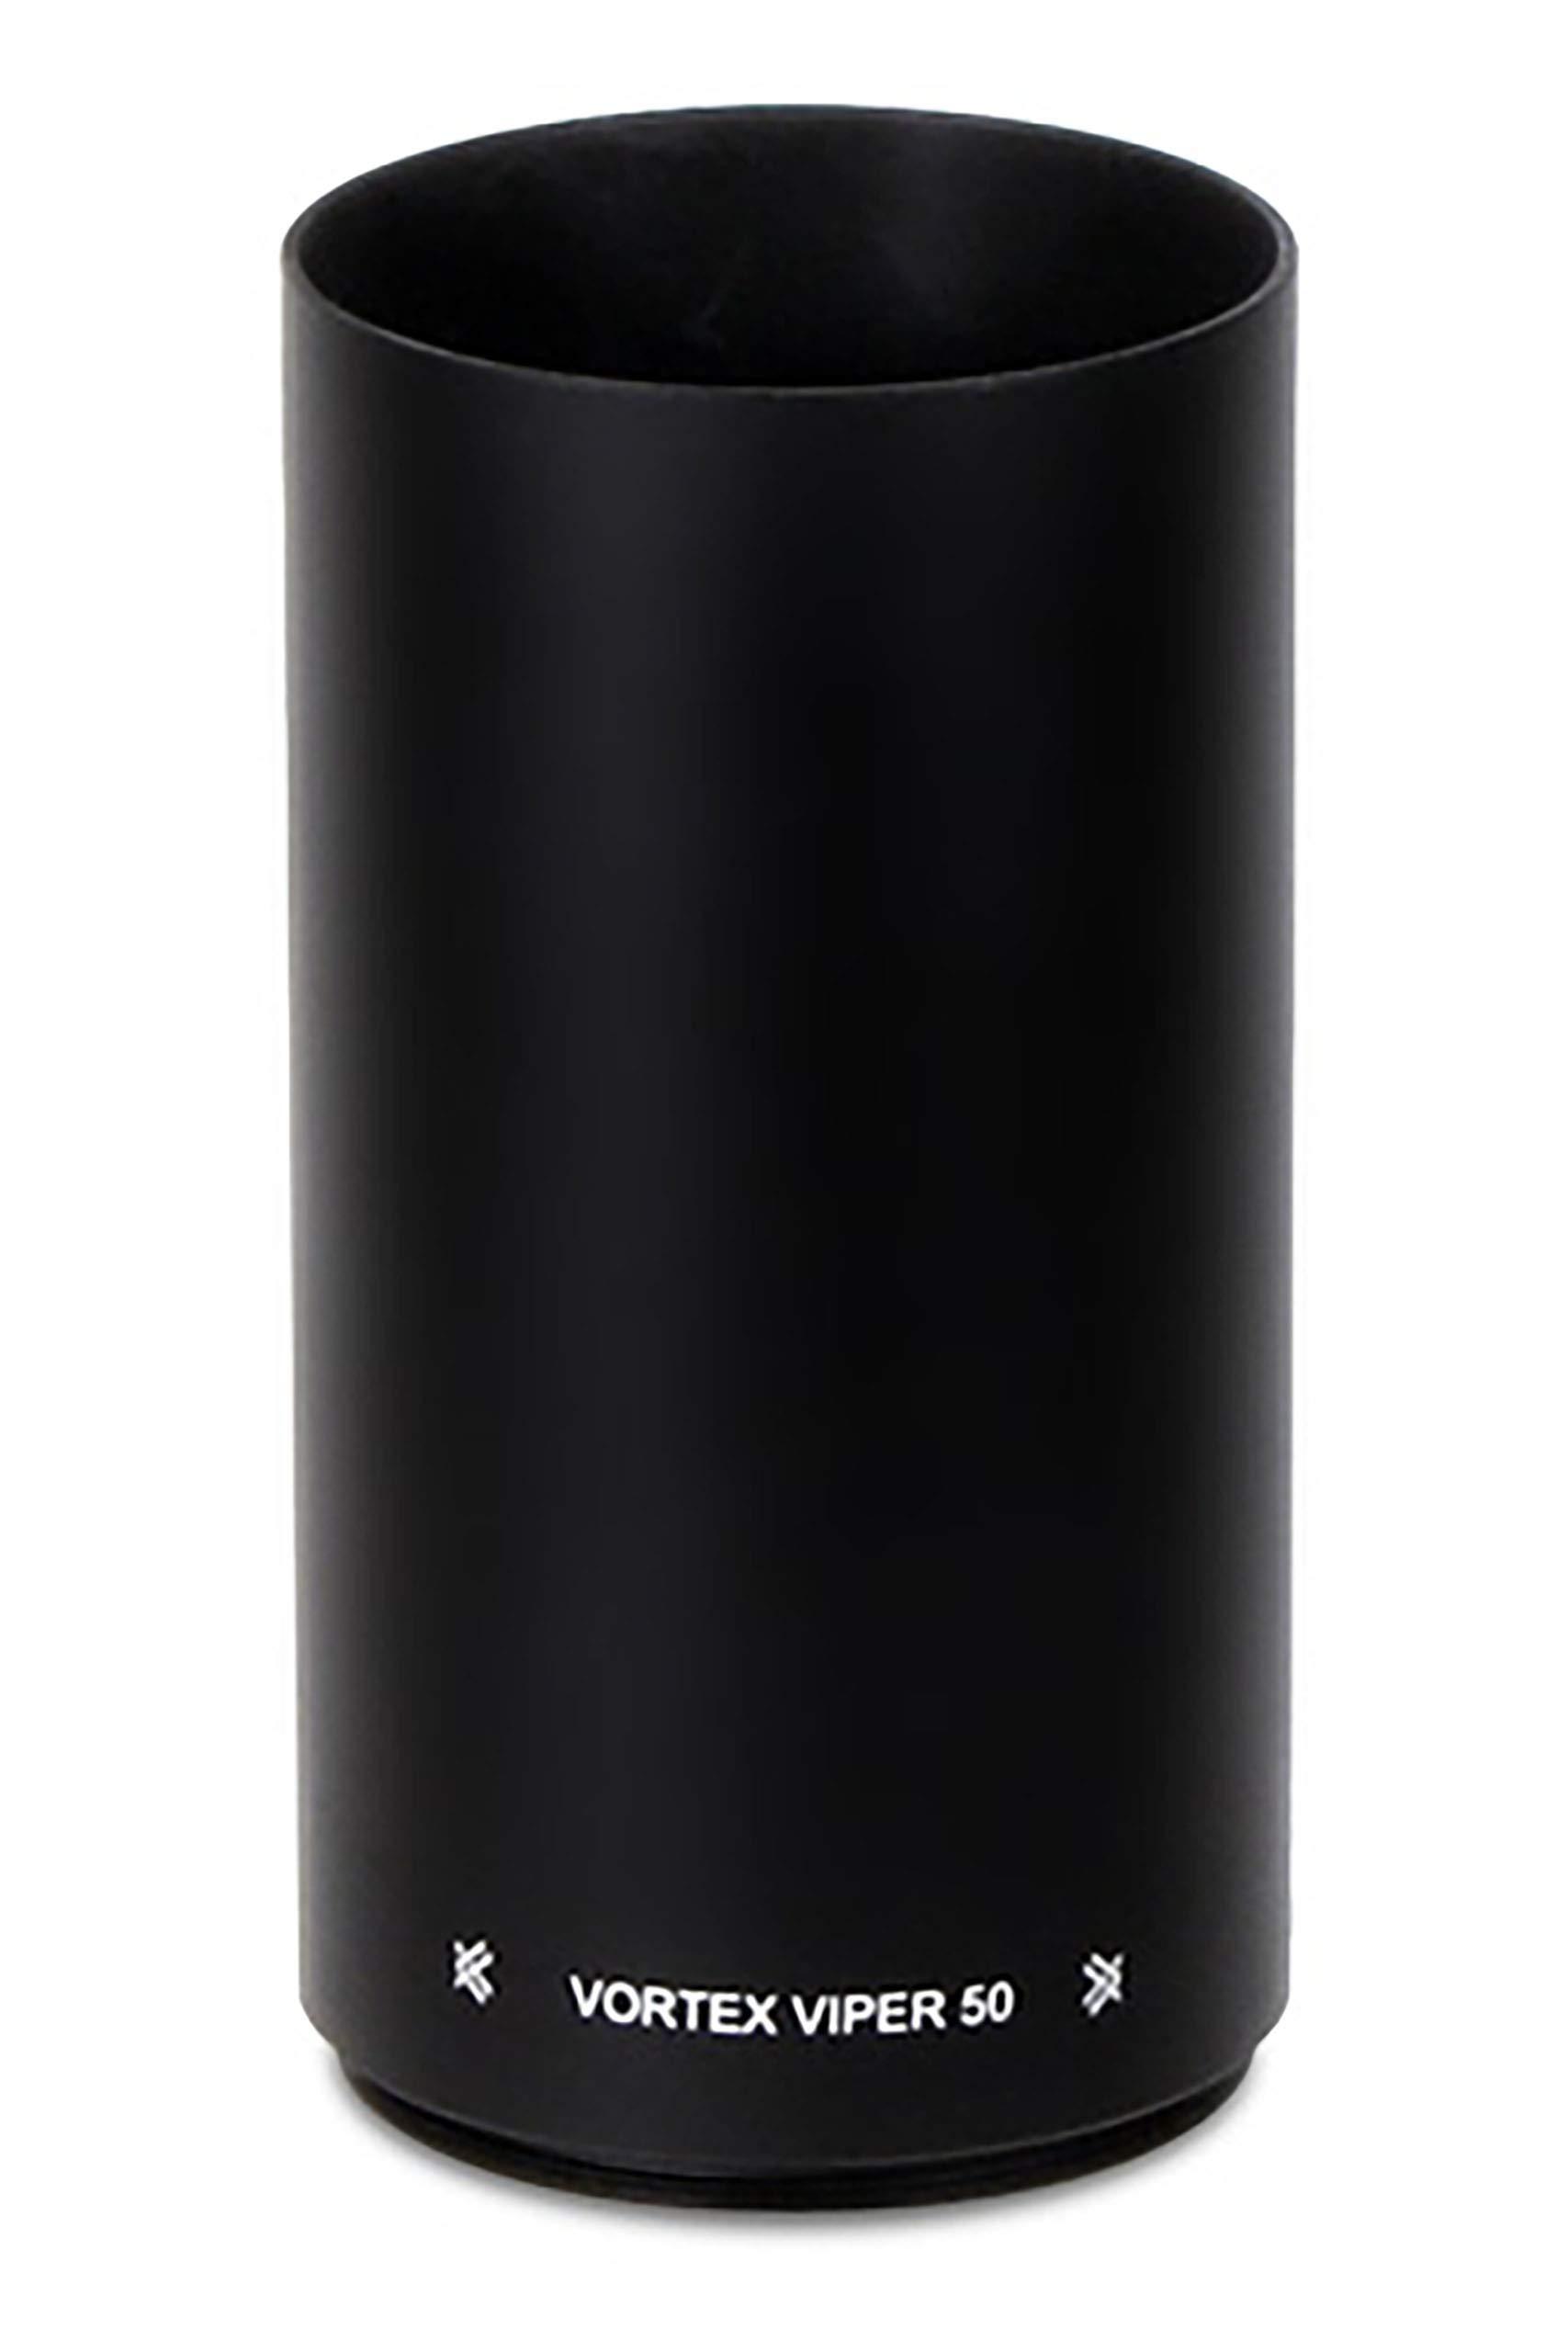 Vortex Optics Viper Riflescope 50 mm Sunshade by Vortex Optics